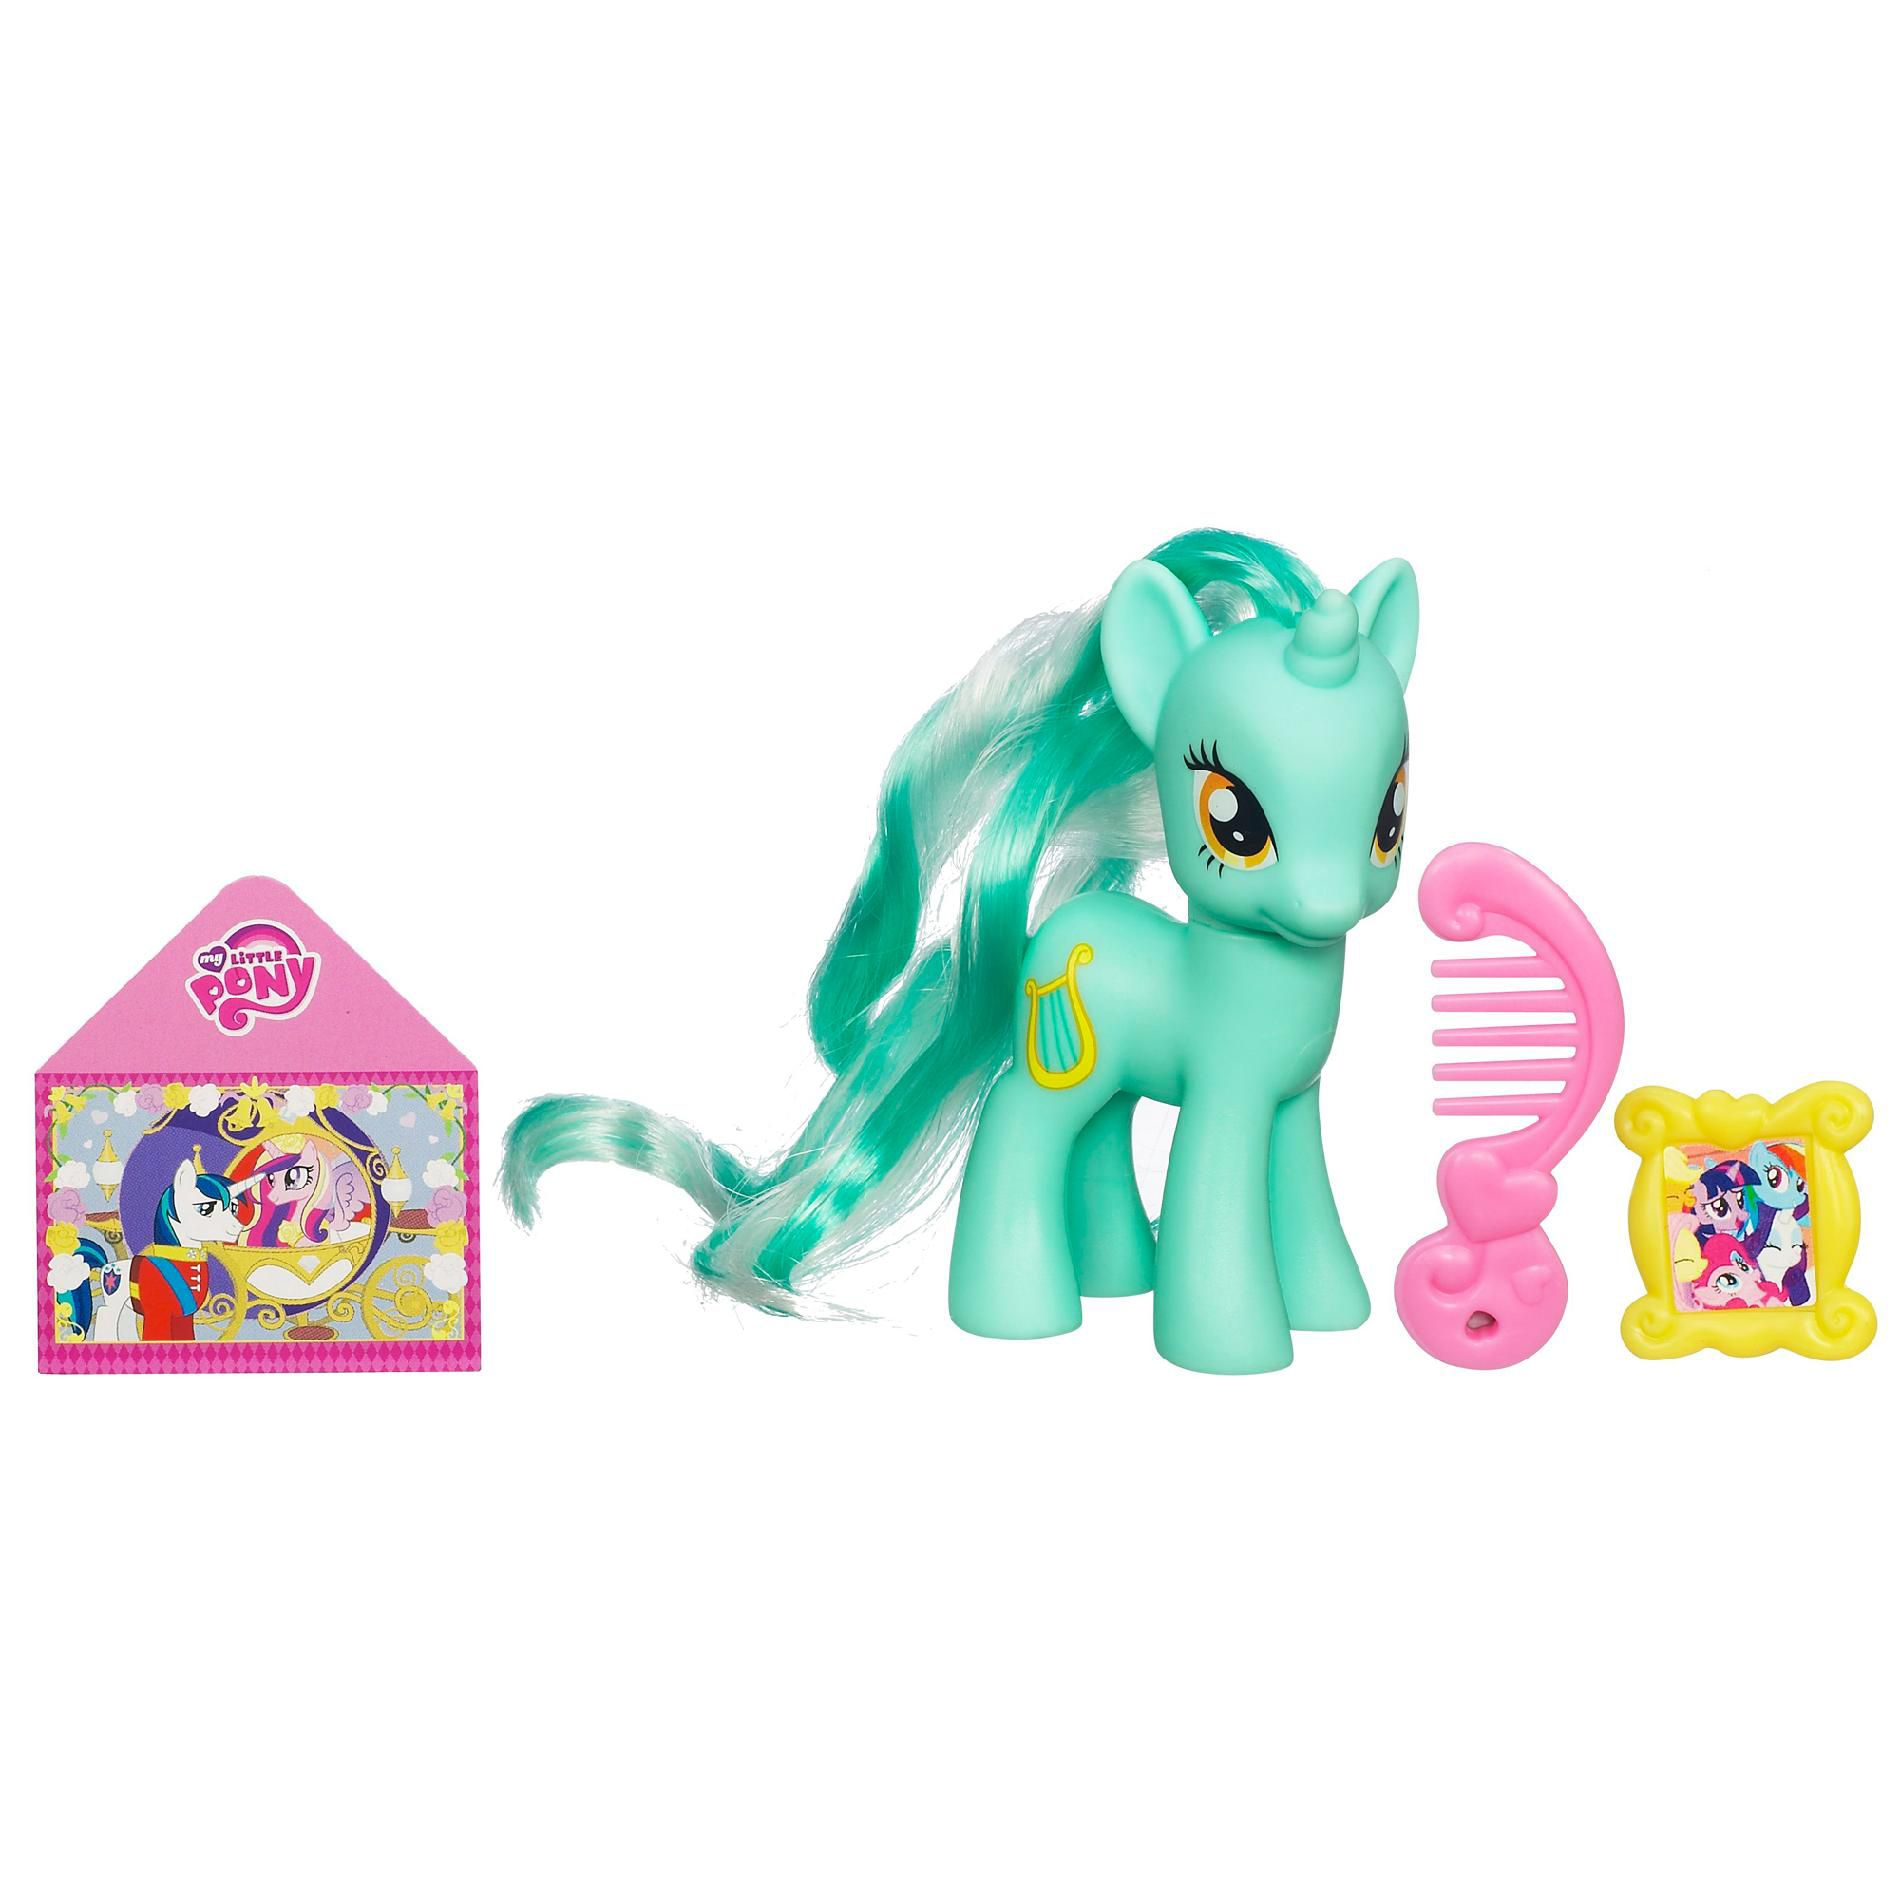 My Little Pony Wedding: Kmart Lyra Heartstrings Royal Wedding Playful Pony